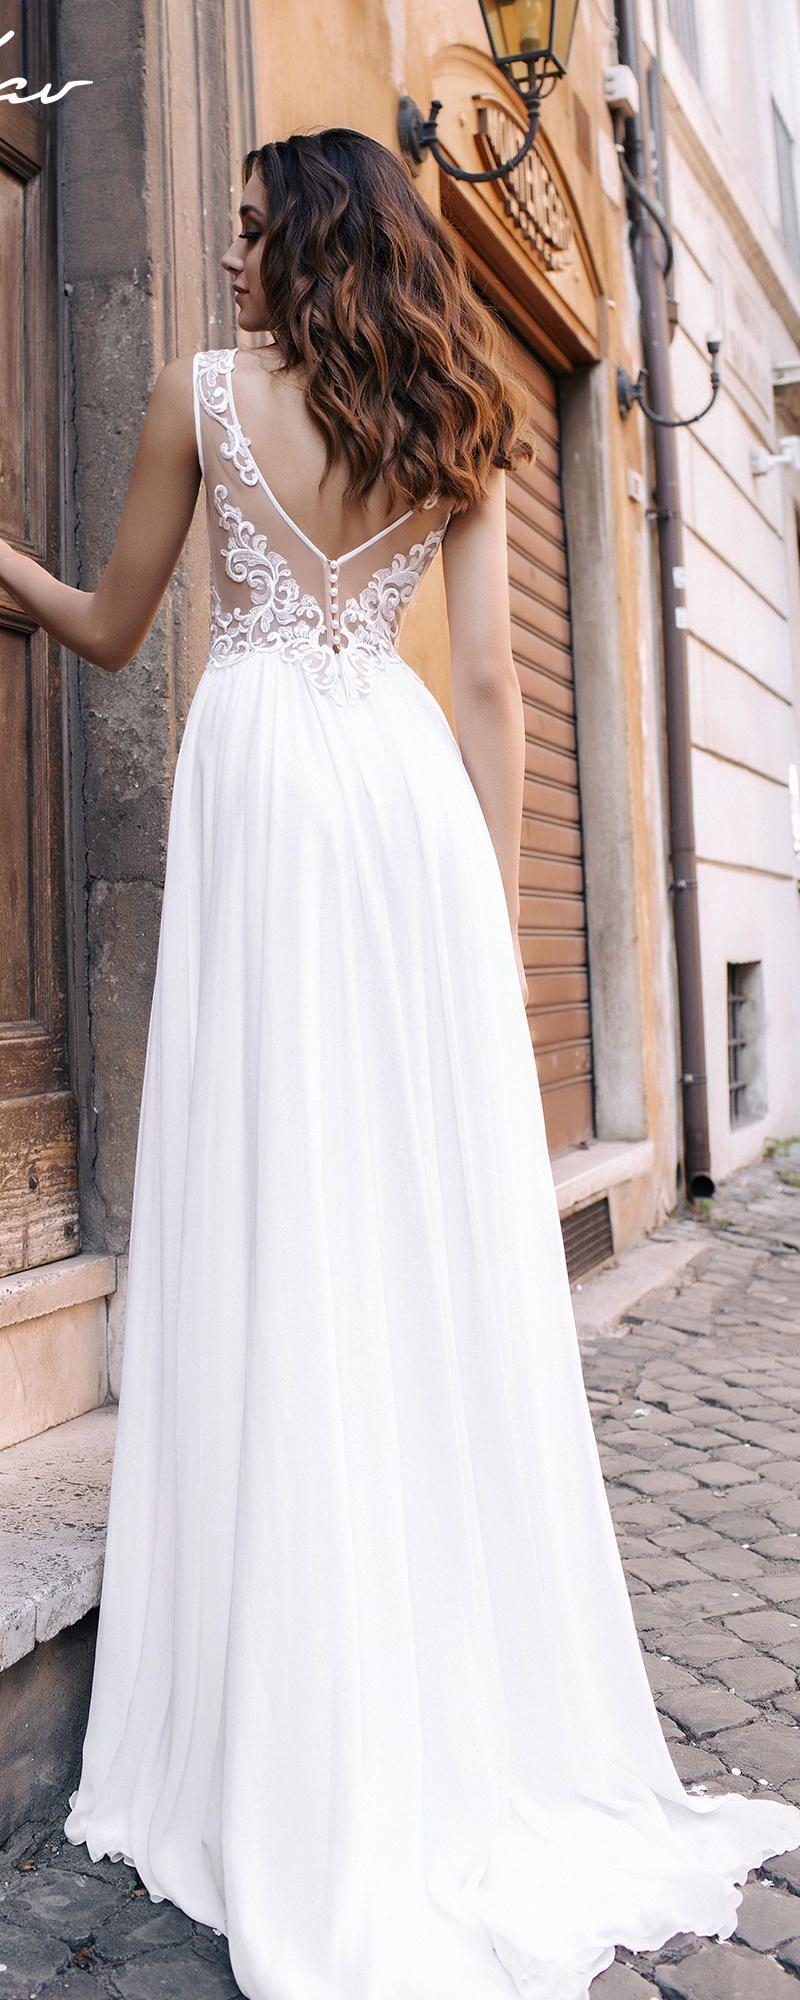 5761df327dc1 Sexy White Chiffon Deep V-neck Elegant Beach Wedding Dresses POLA  weddings   weddingdresses  dresses  fashion  bridaldresses  weddingideas